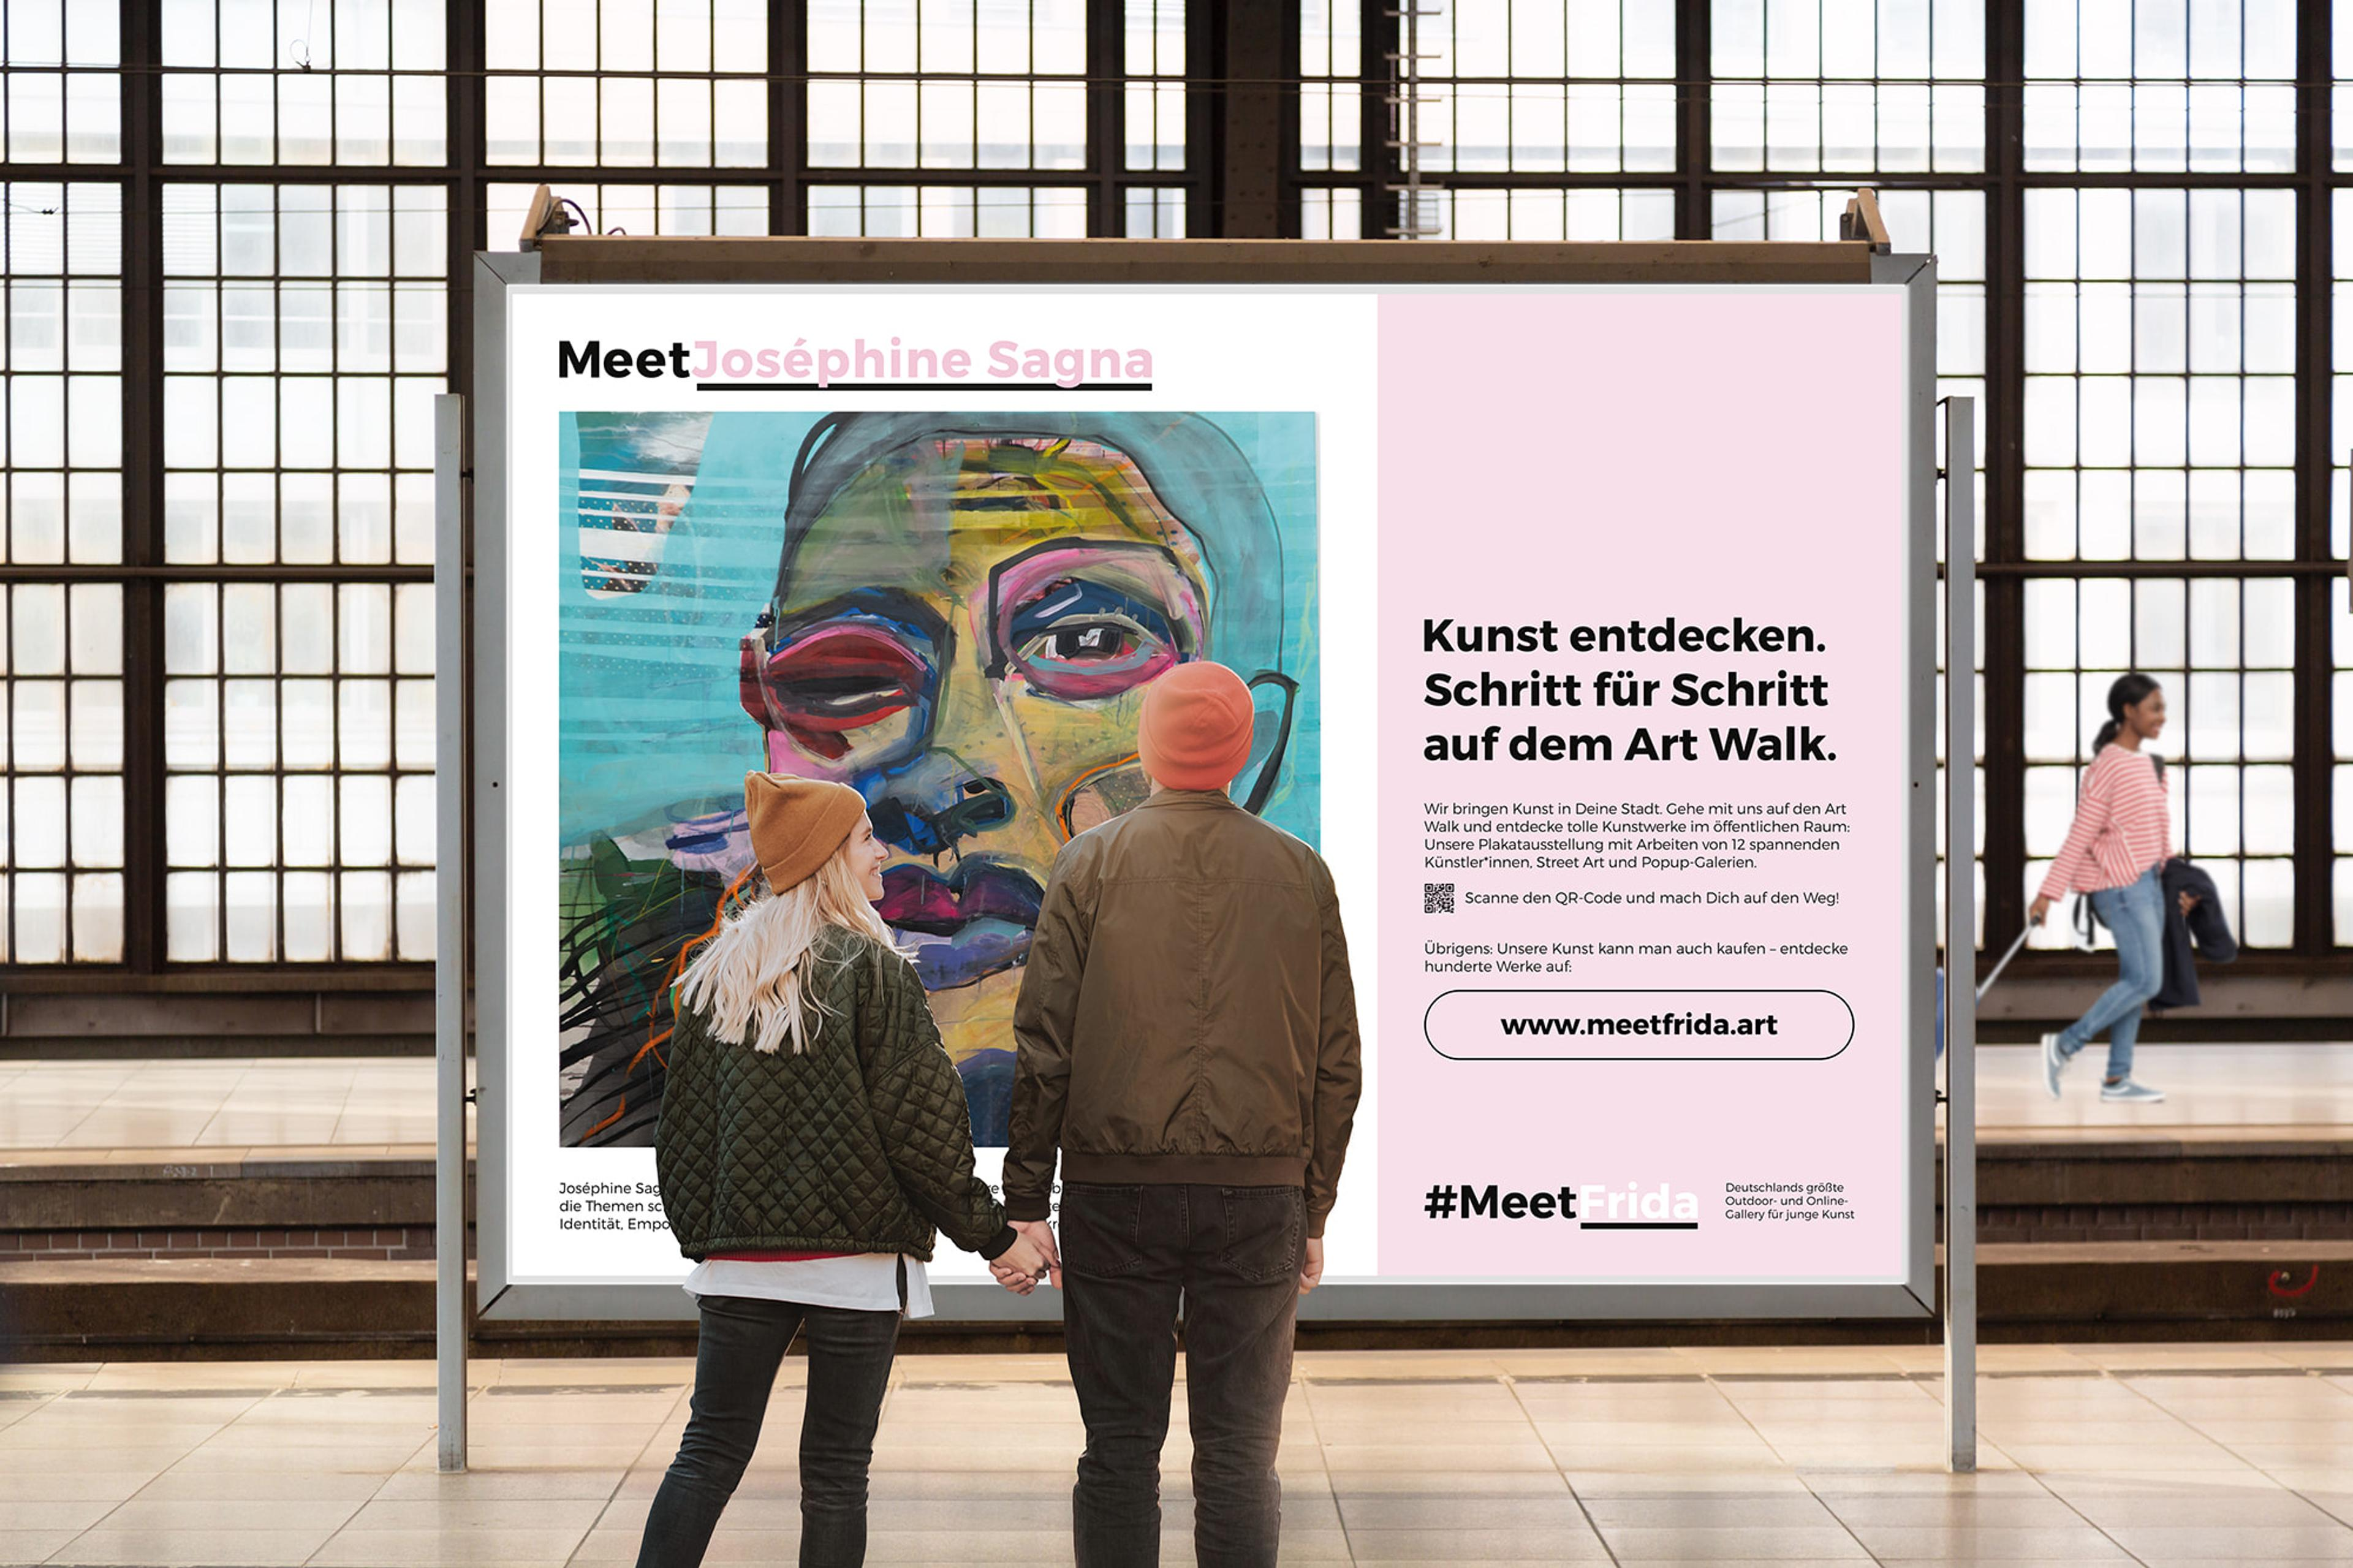 MeetFrida Plakat vor Elbphilharmonie